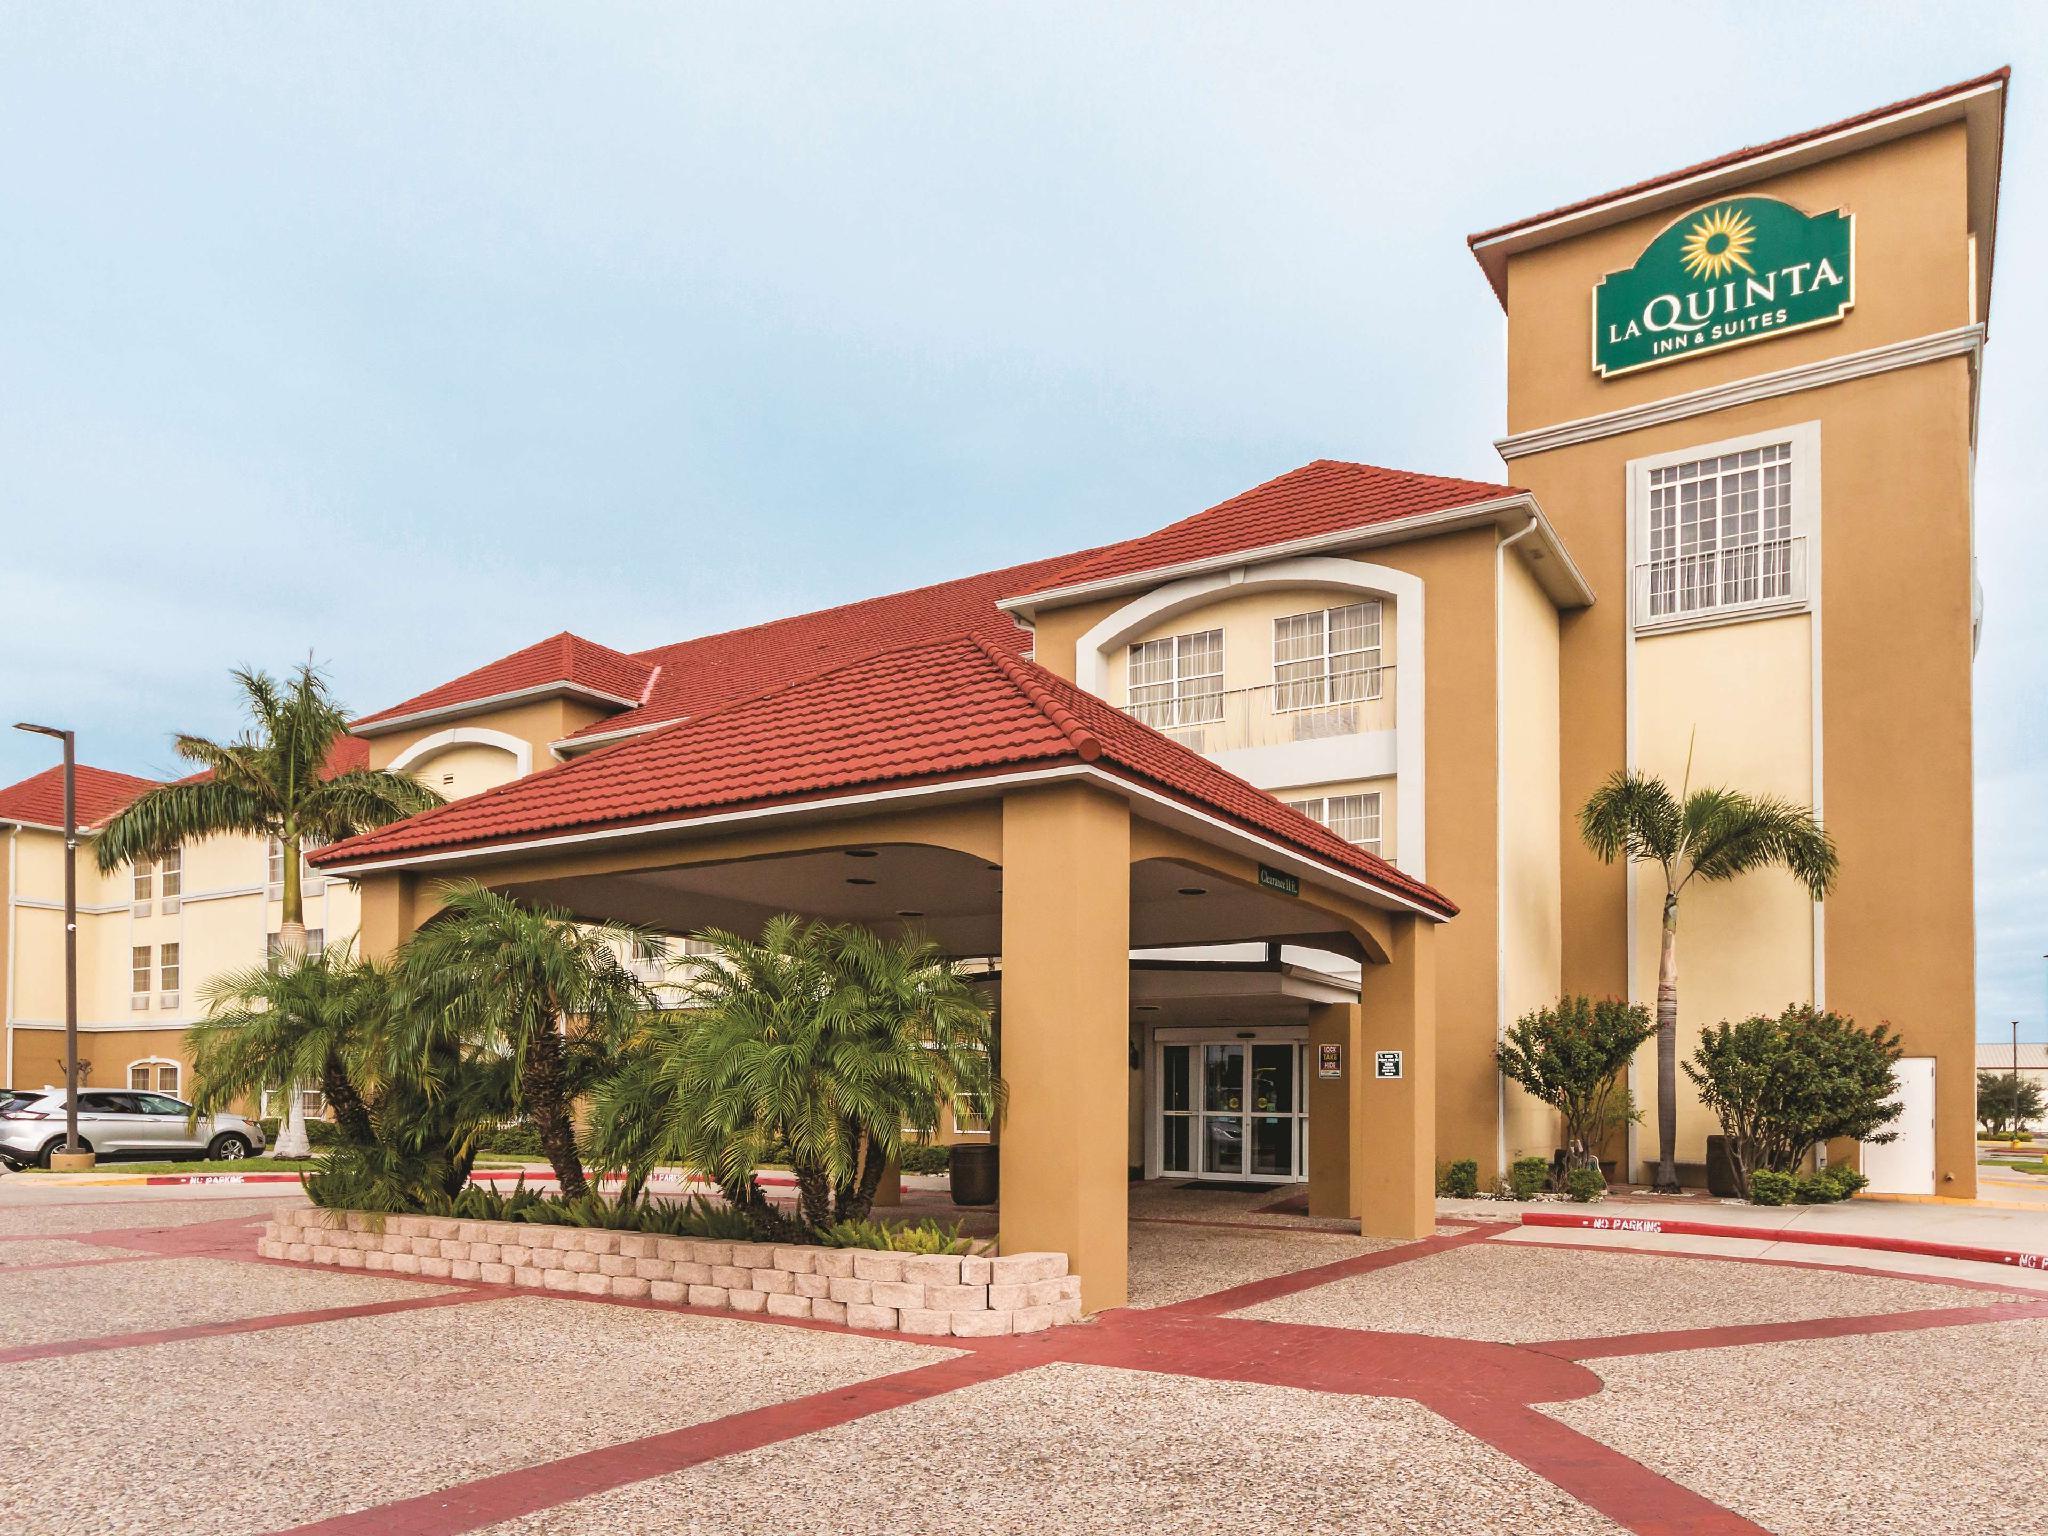 La Quinta Inn And Suites By Wyndham Pharr   Rio Grande Valley